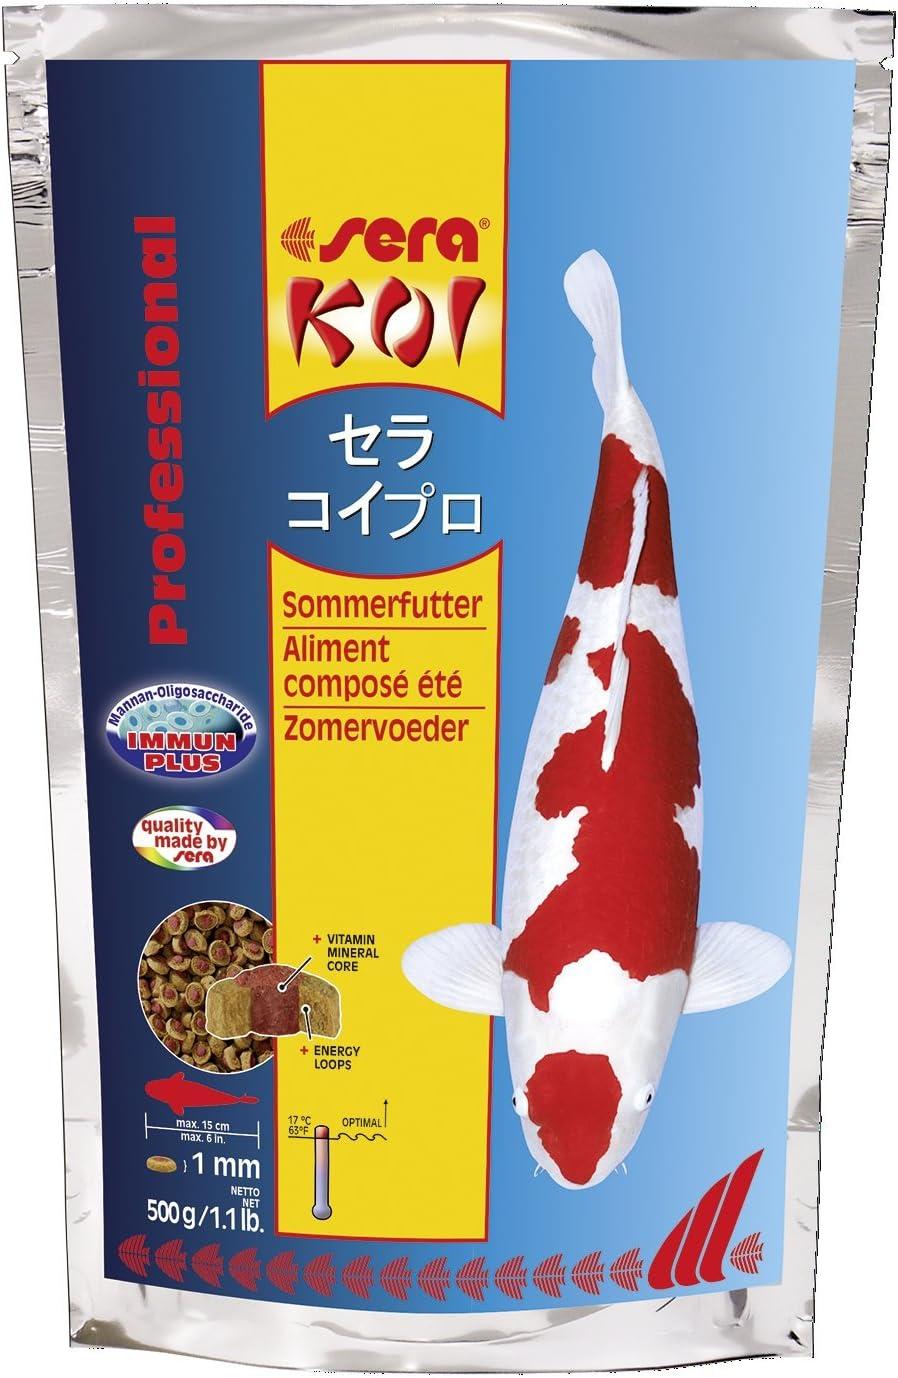 Sera 7014 KOI Professional Summer 1.1 lb 500g Pet Food, One Size